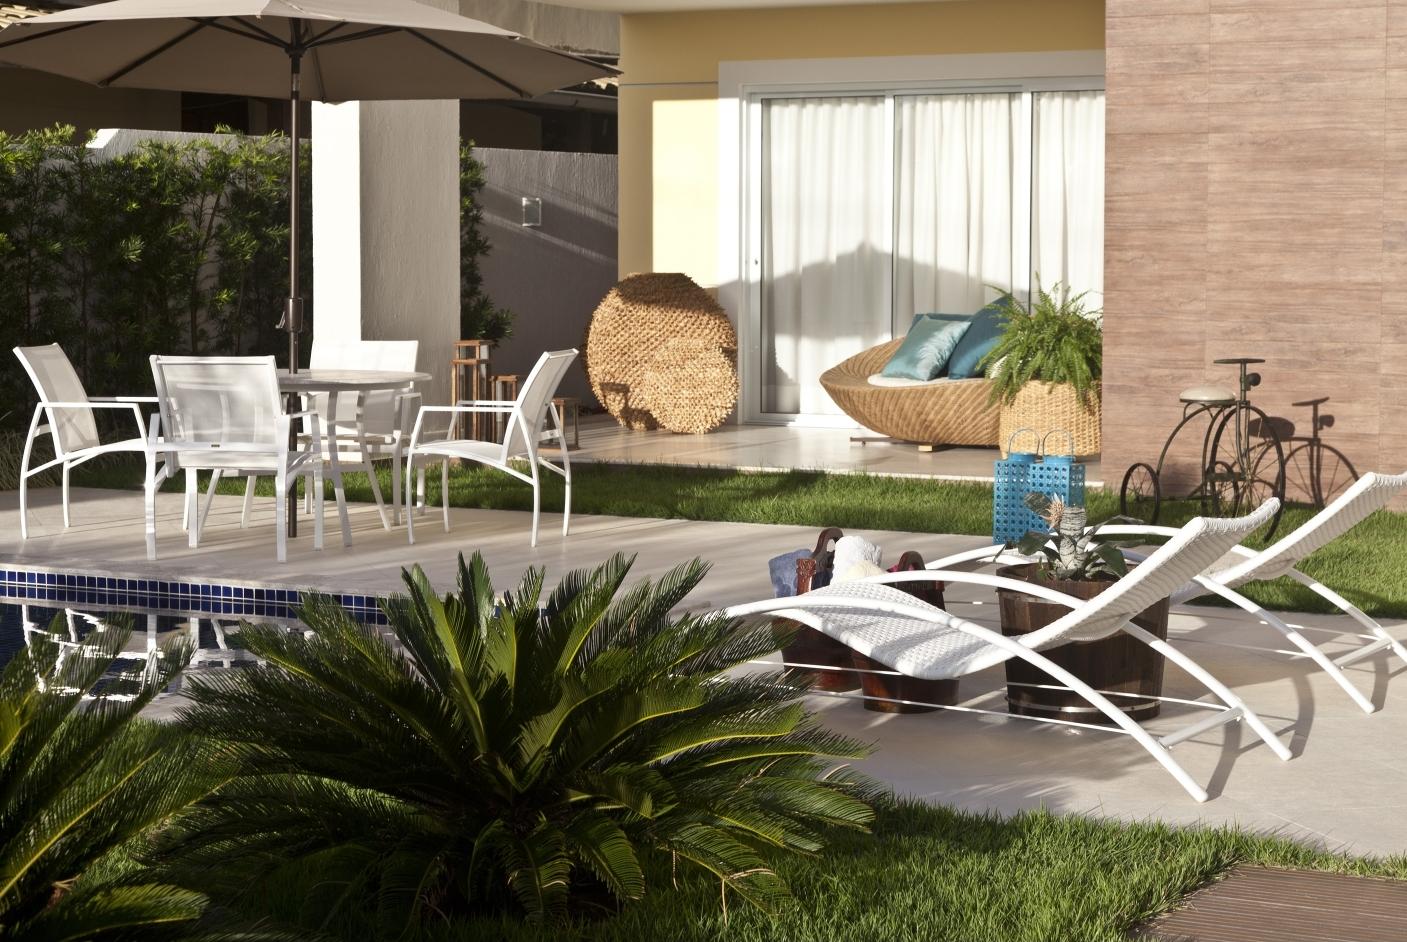 Fibra sintética para piscina e varanda